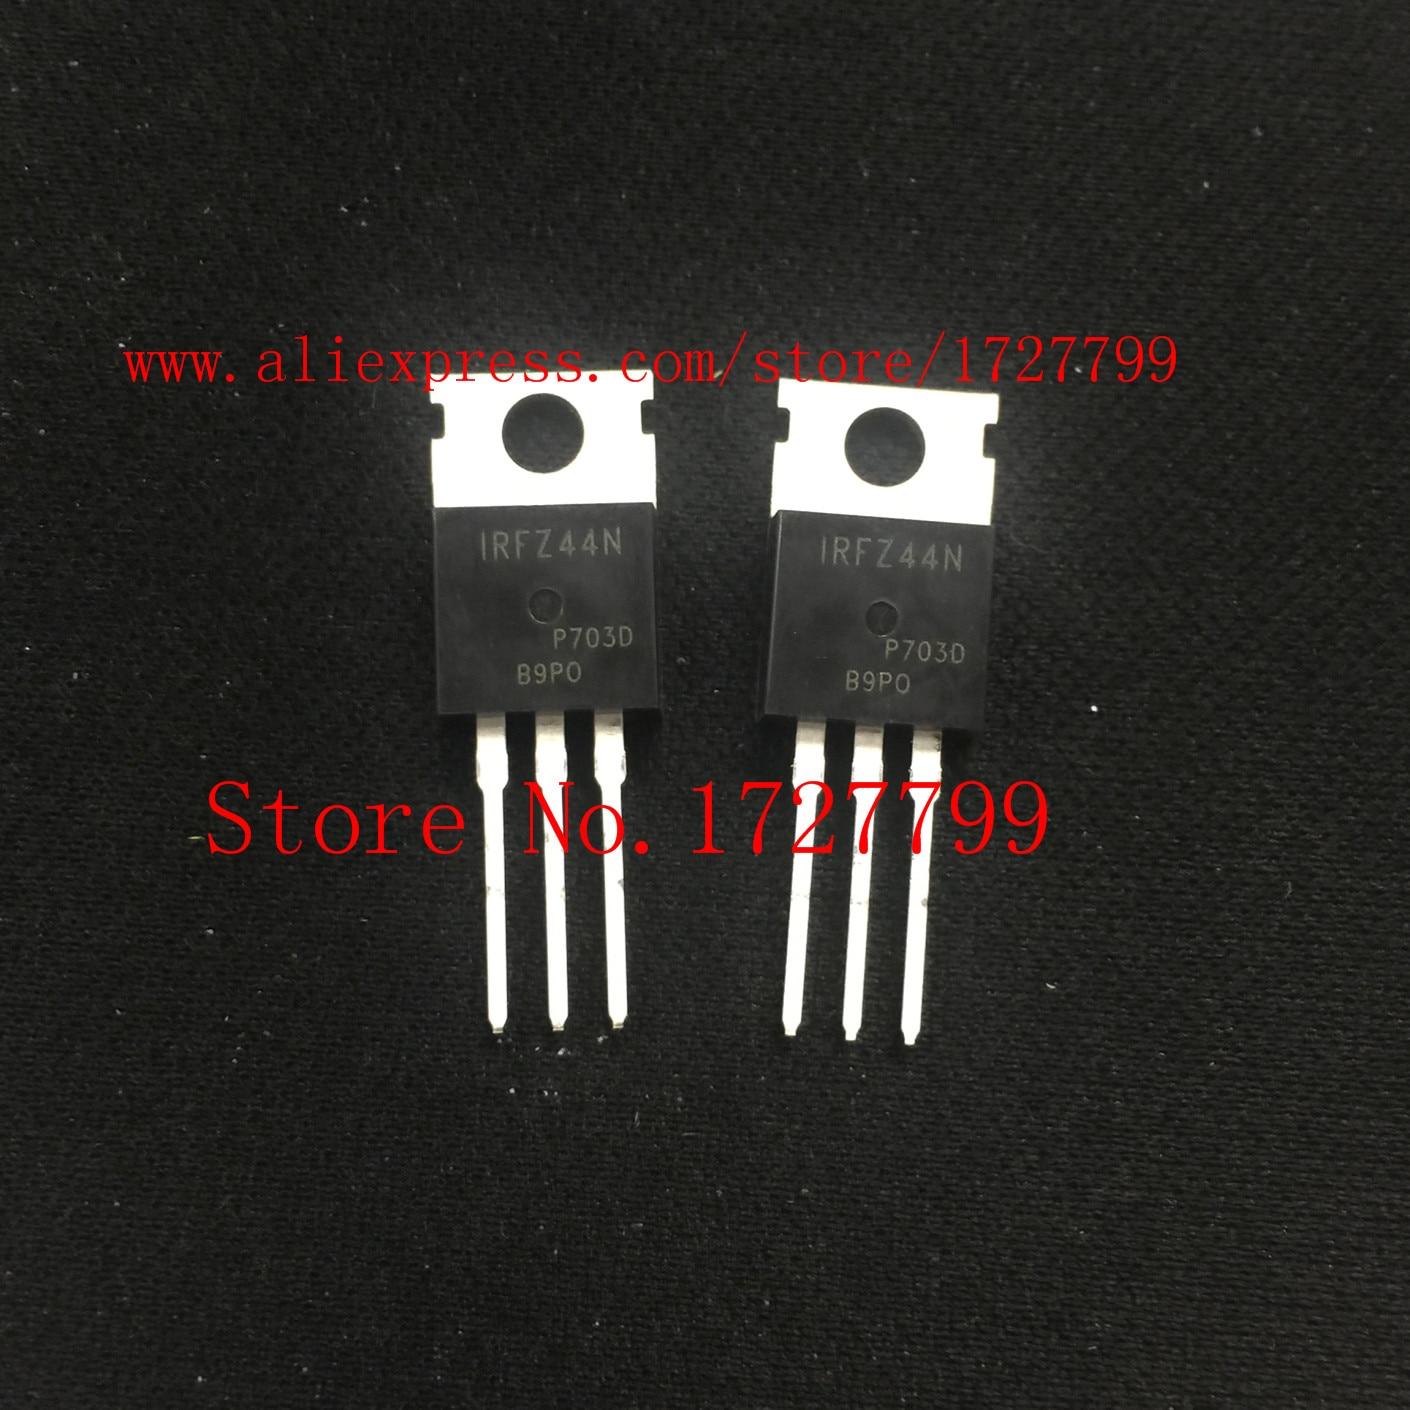 10PCS/LOT IRFZ44N IRFZ44  49A 55V TO-220 MOSFET NEW10PCS/LOT IRFZ44N IRFZ44  49A 55V TO-220 MOSFET NEW